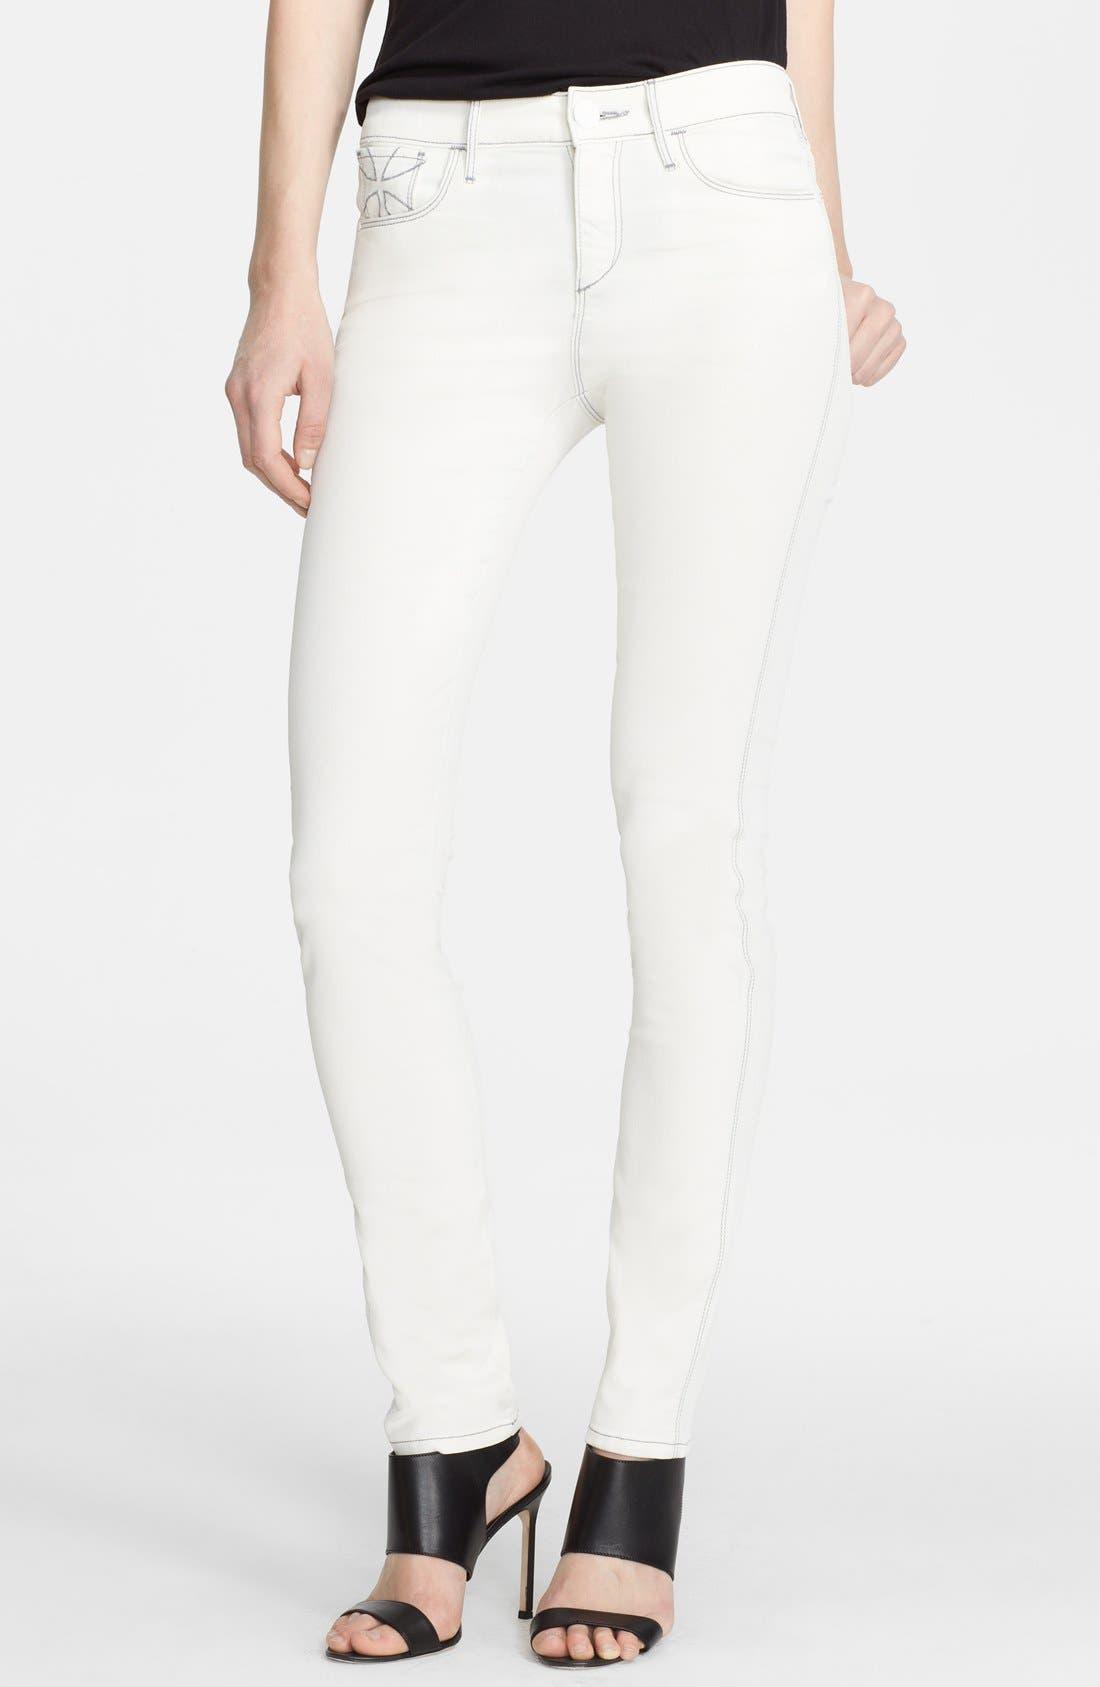 Alternate Image 1 Selected - Habitual 'Eve' Skinny Jeans